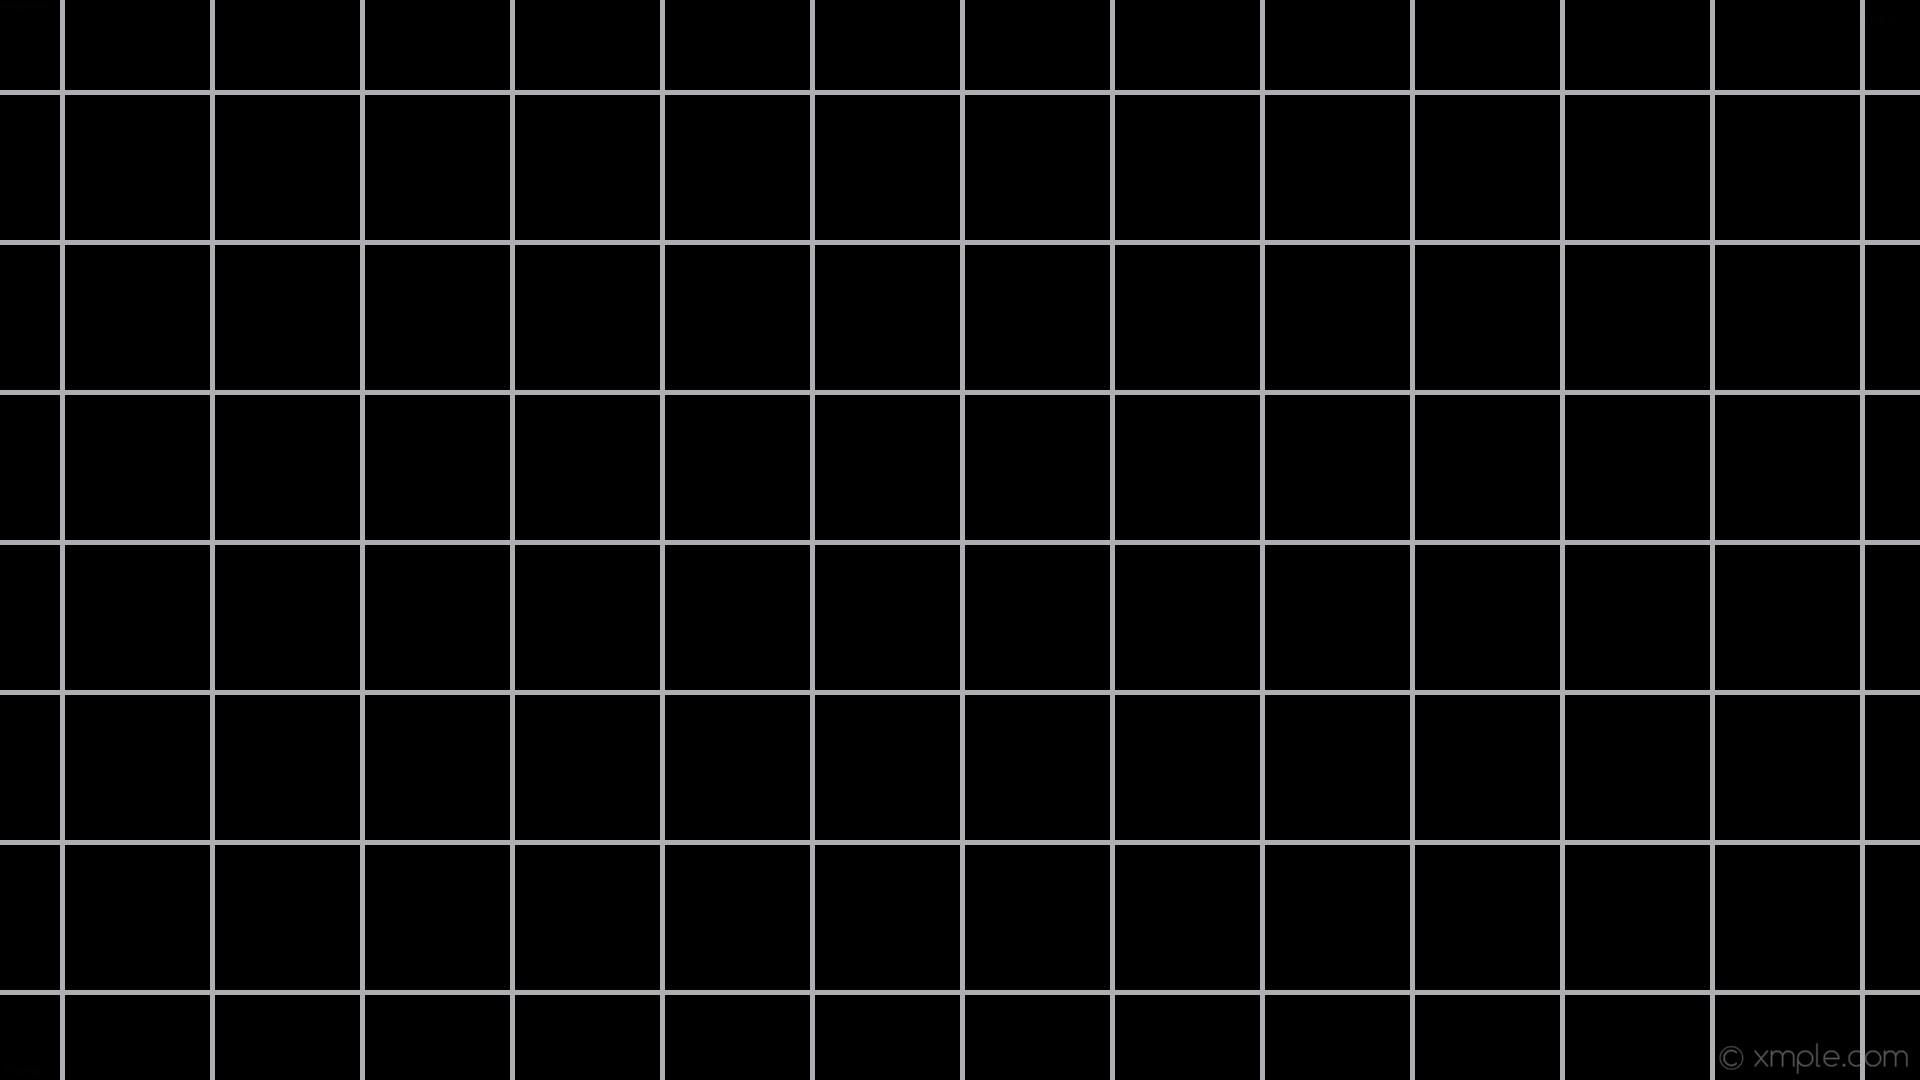 wallpaper graph paper white black grid ghost white #000000 #f8f8ff 0° 5px  150px